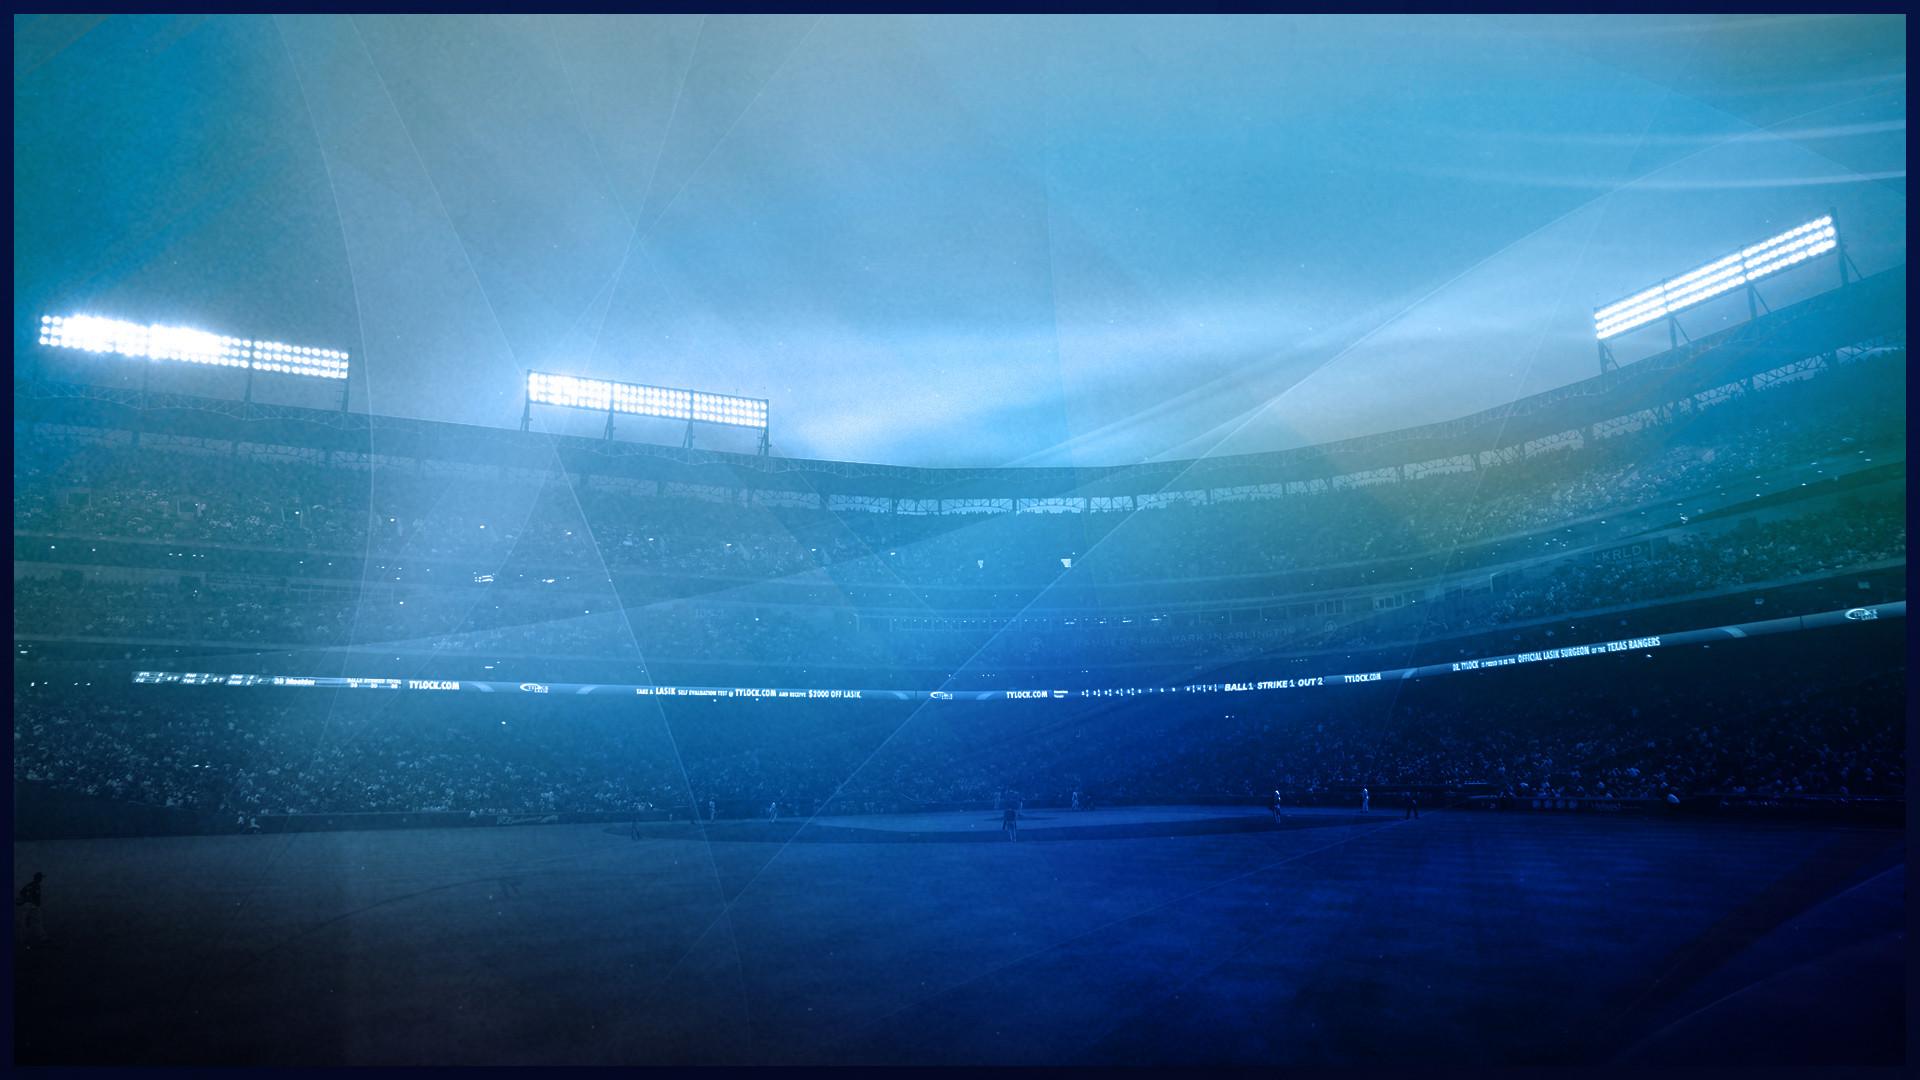 Soccer Wallpaper & Backgrounds | Football Wallpapers for Desktop, Tablet &  Mobile